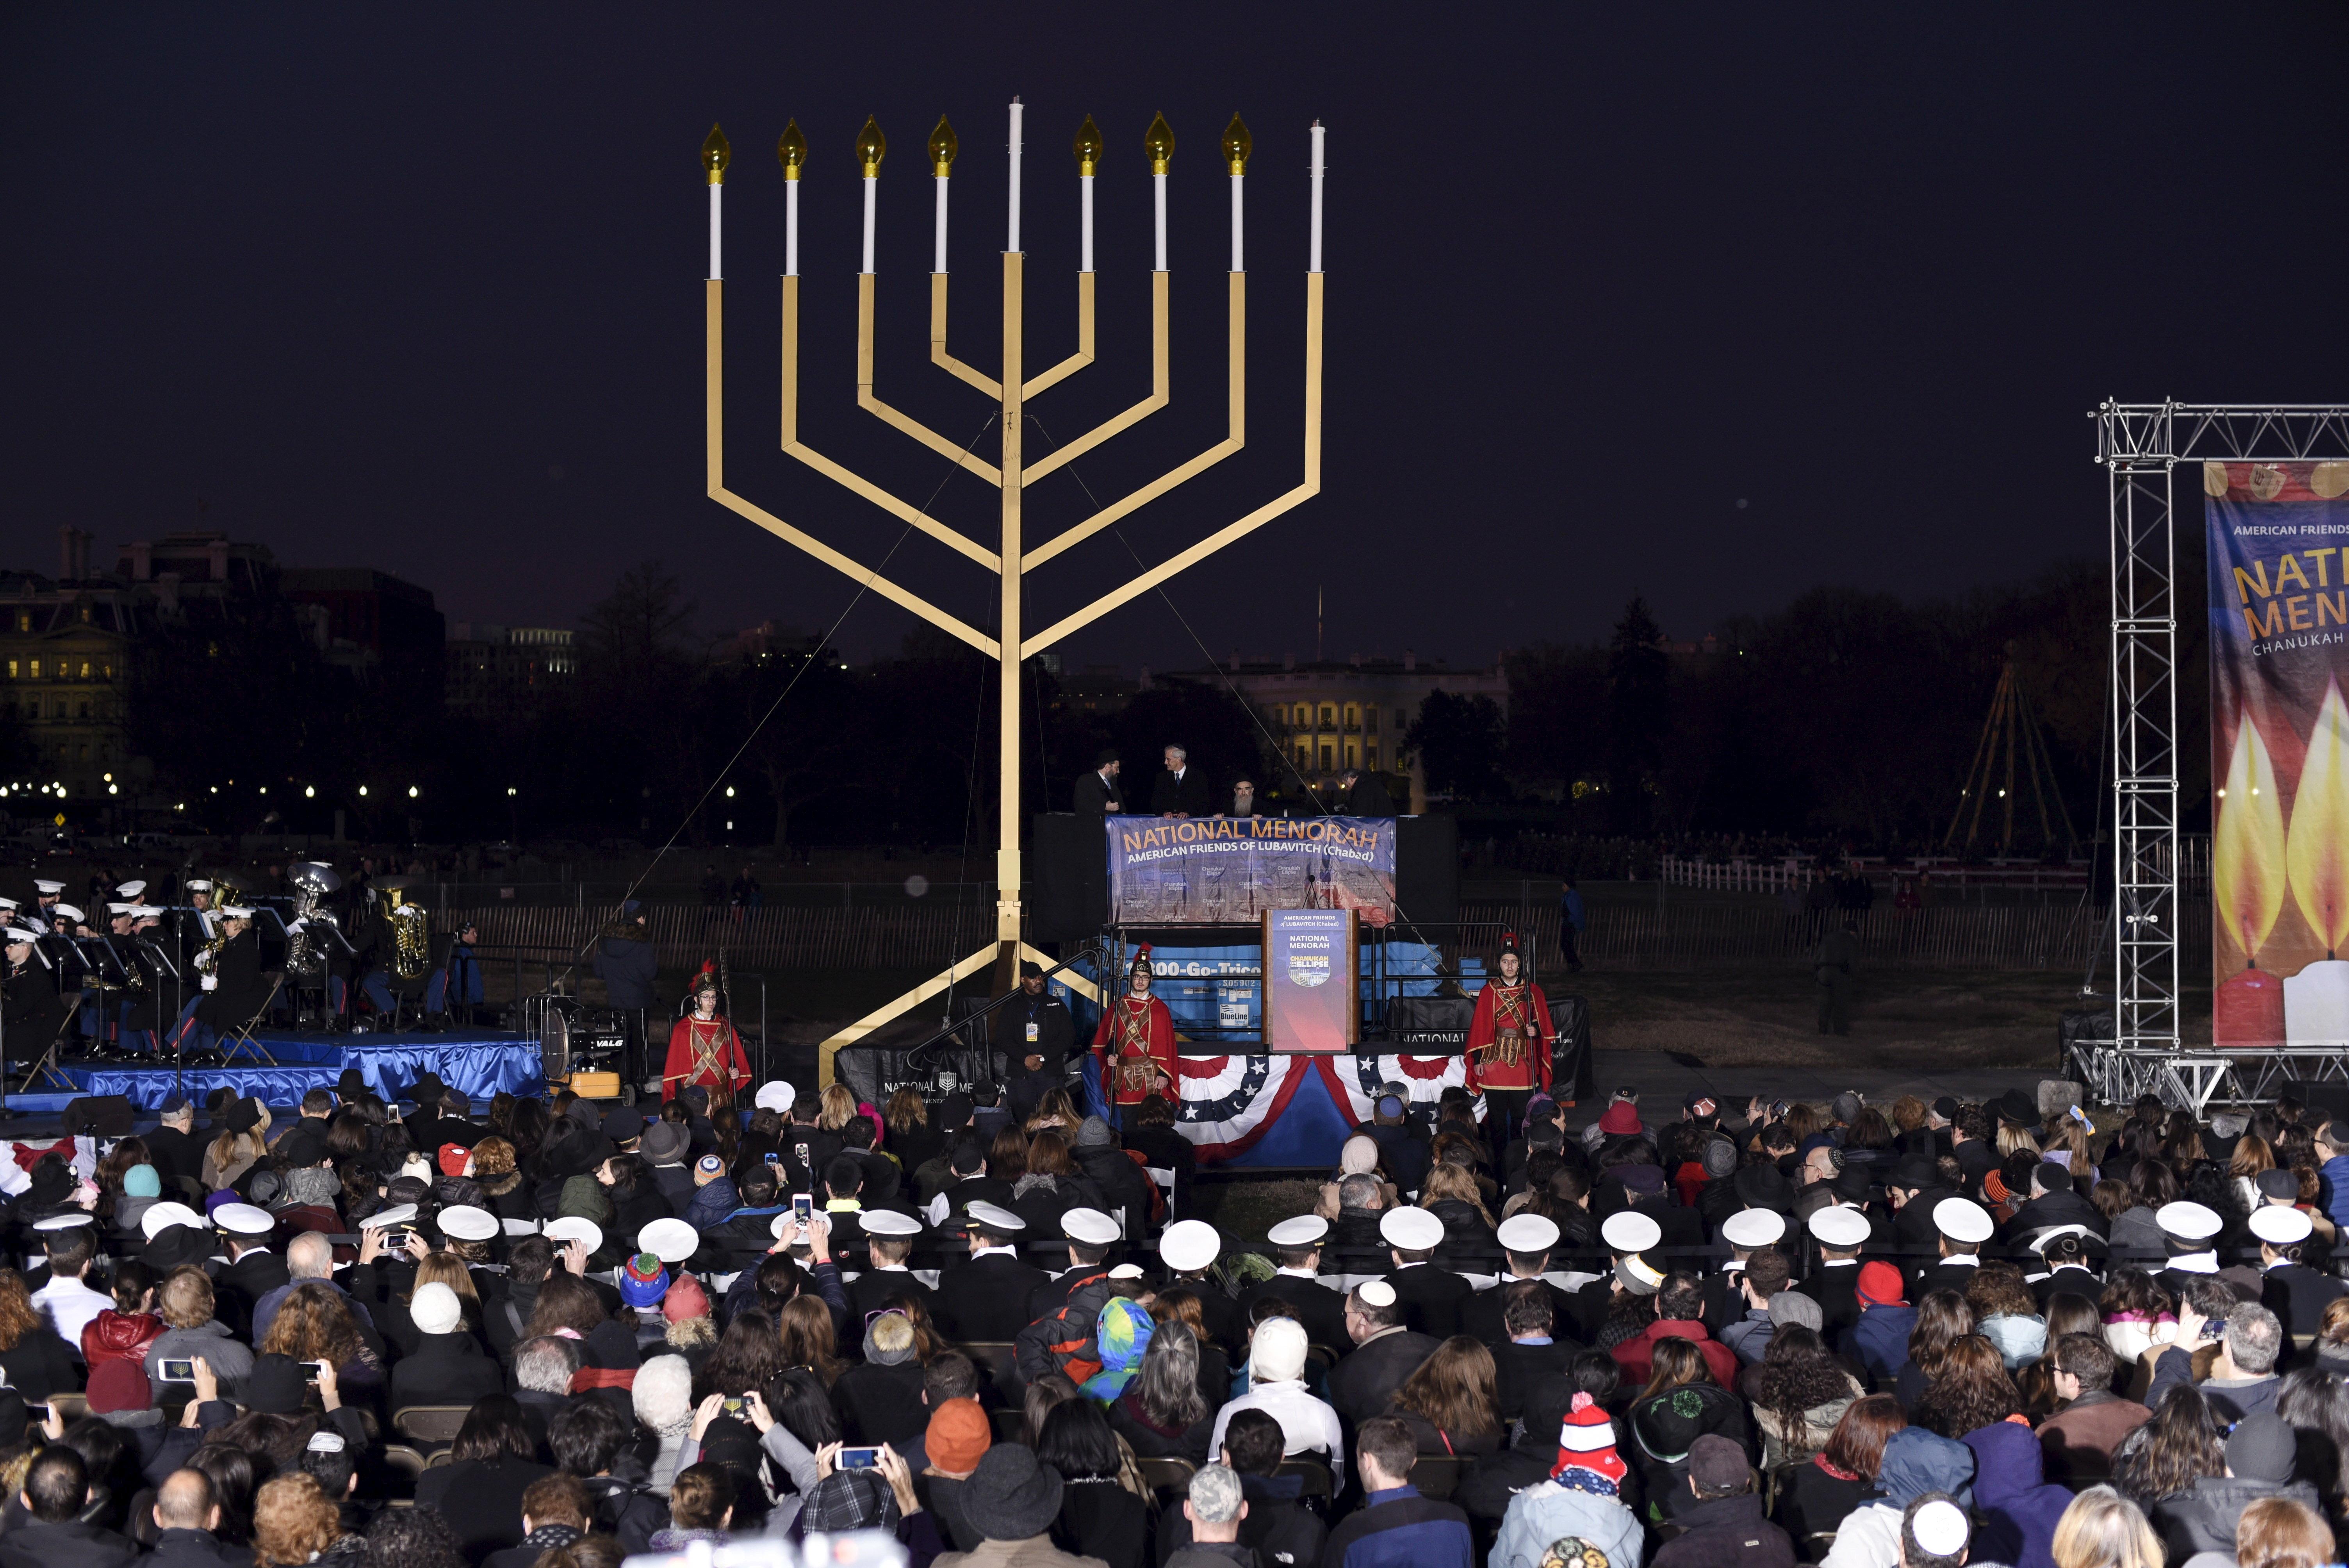 The audience waits for the lighting of the U.S. National Chanukah (Hanukkah) Menorah on the Ellipse in Washington, December 6, 2015.  REUTERS/Sait Serkan Gurbuz